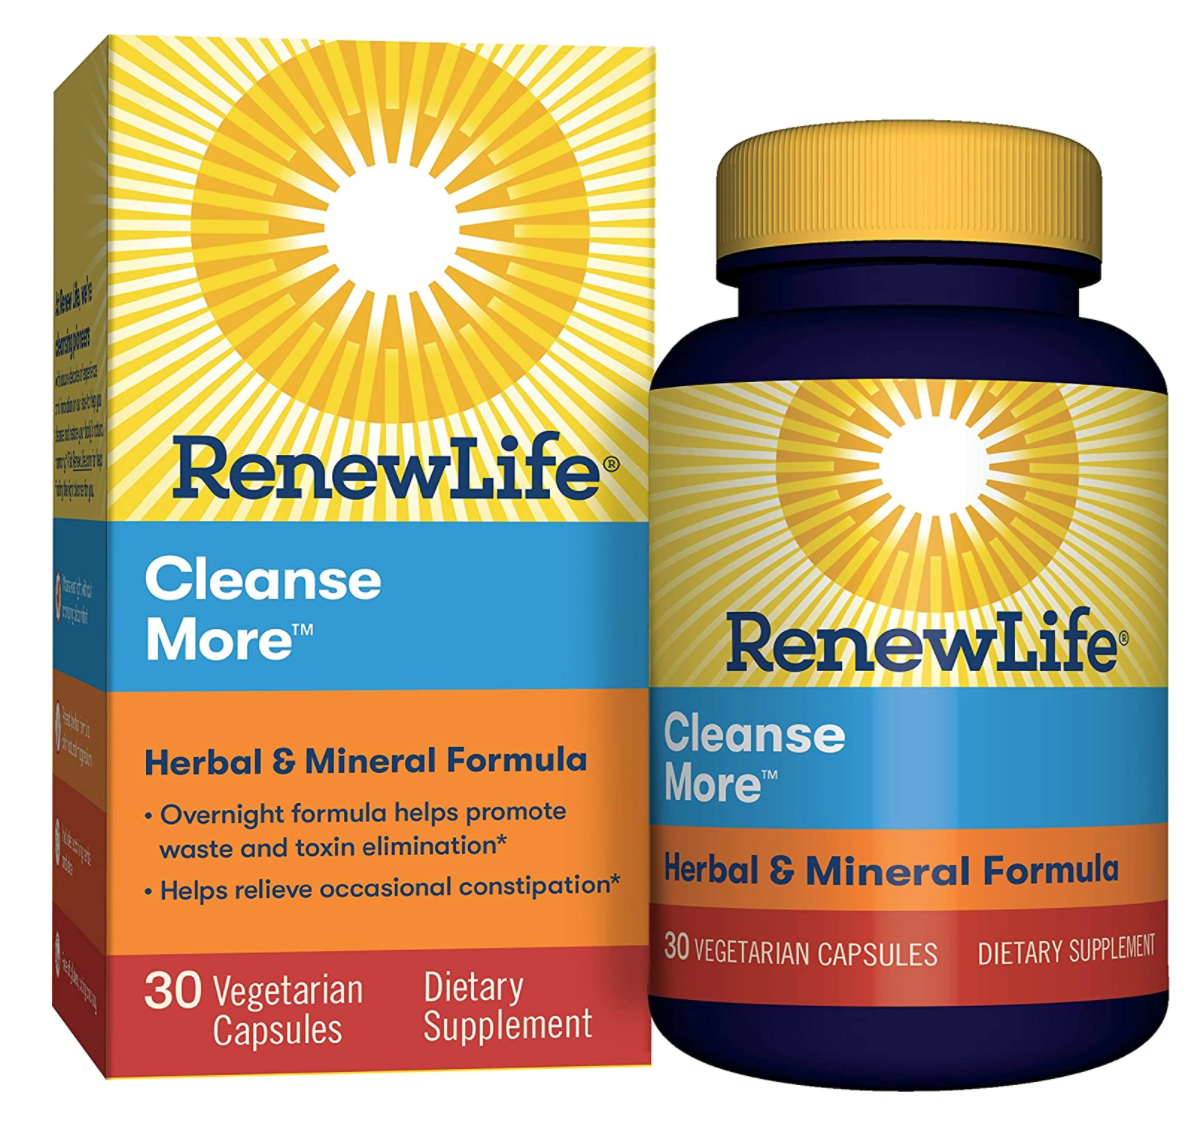 Vegan, Gluten Free, Non-Gmo, Natural, Cleansemore Constipation relief